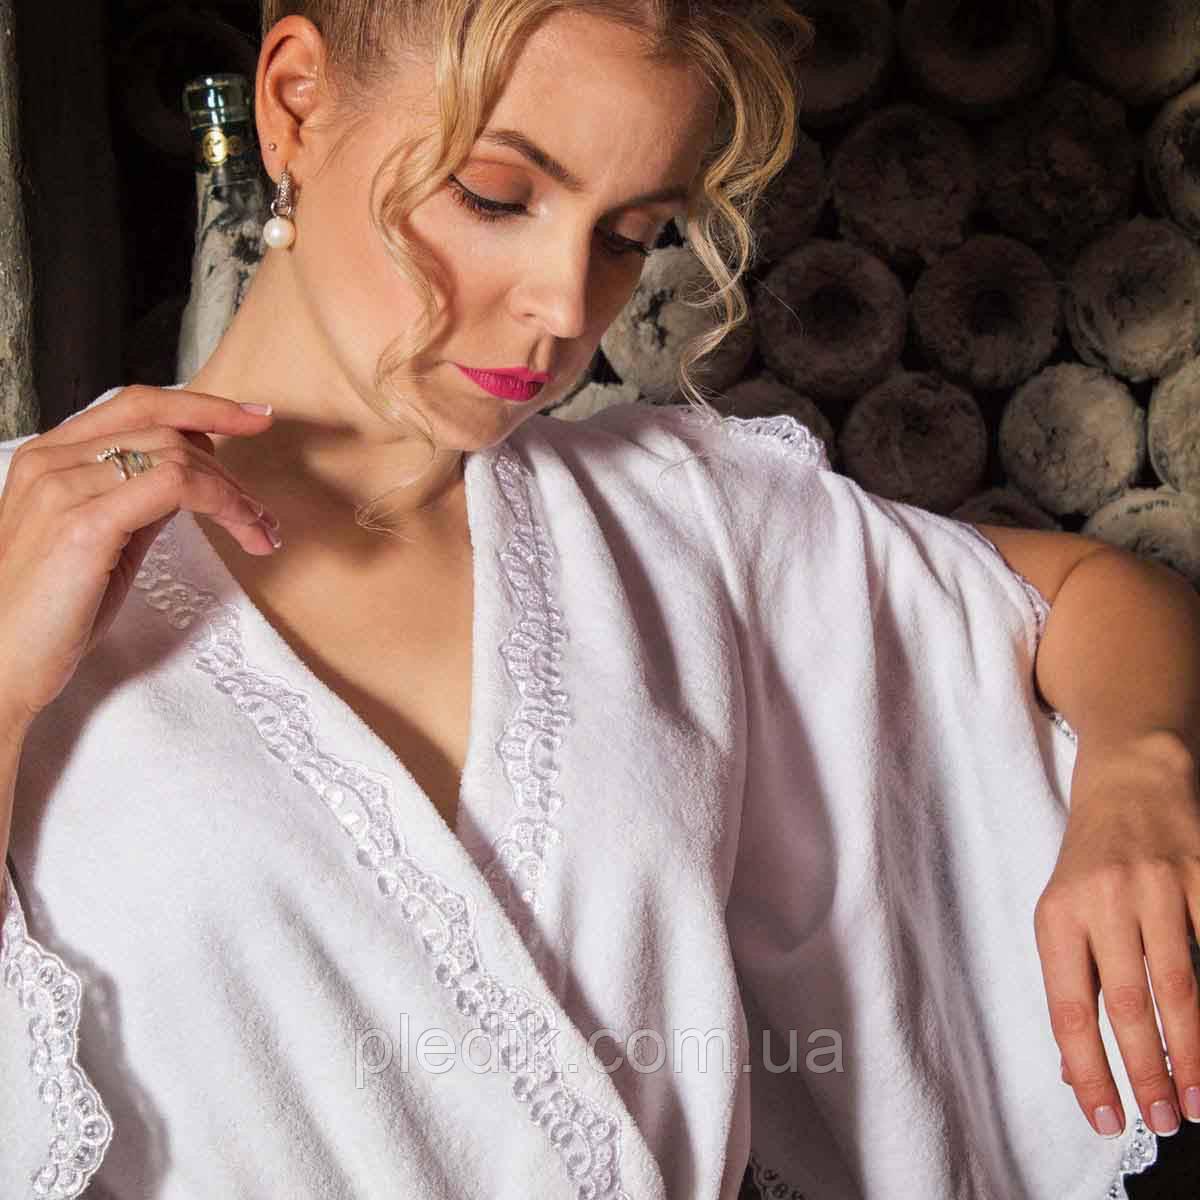 Махровый халат с кружевами ROSETTA белый M. Все размеры.